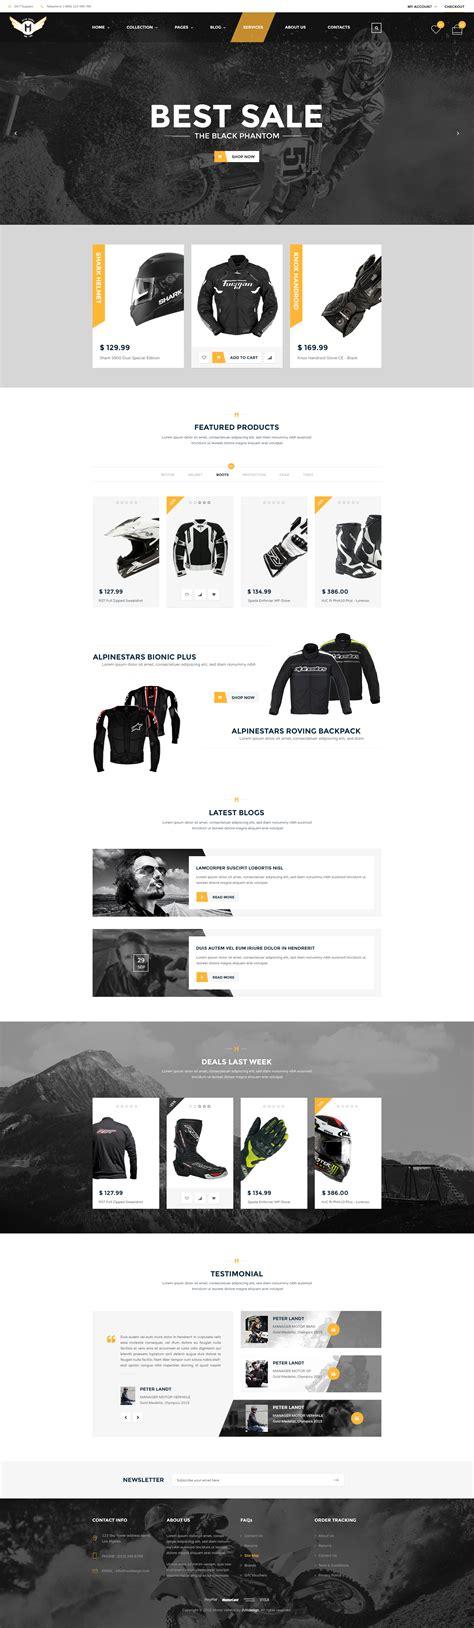 themeforest motors motor vehikal motorcycle online store wordpress theme by